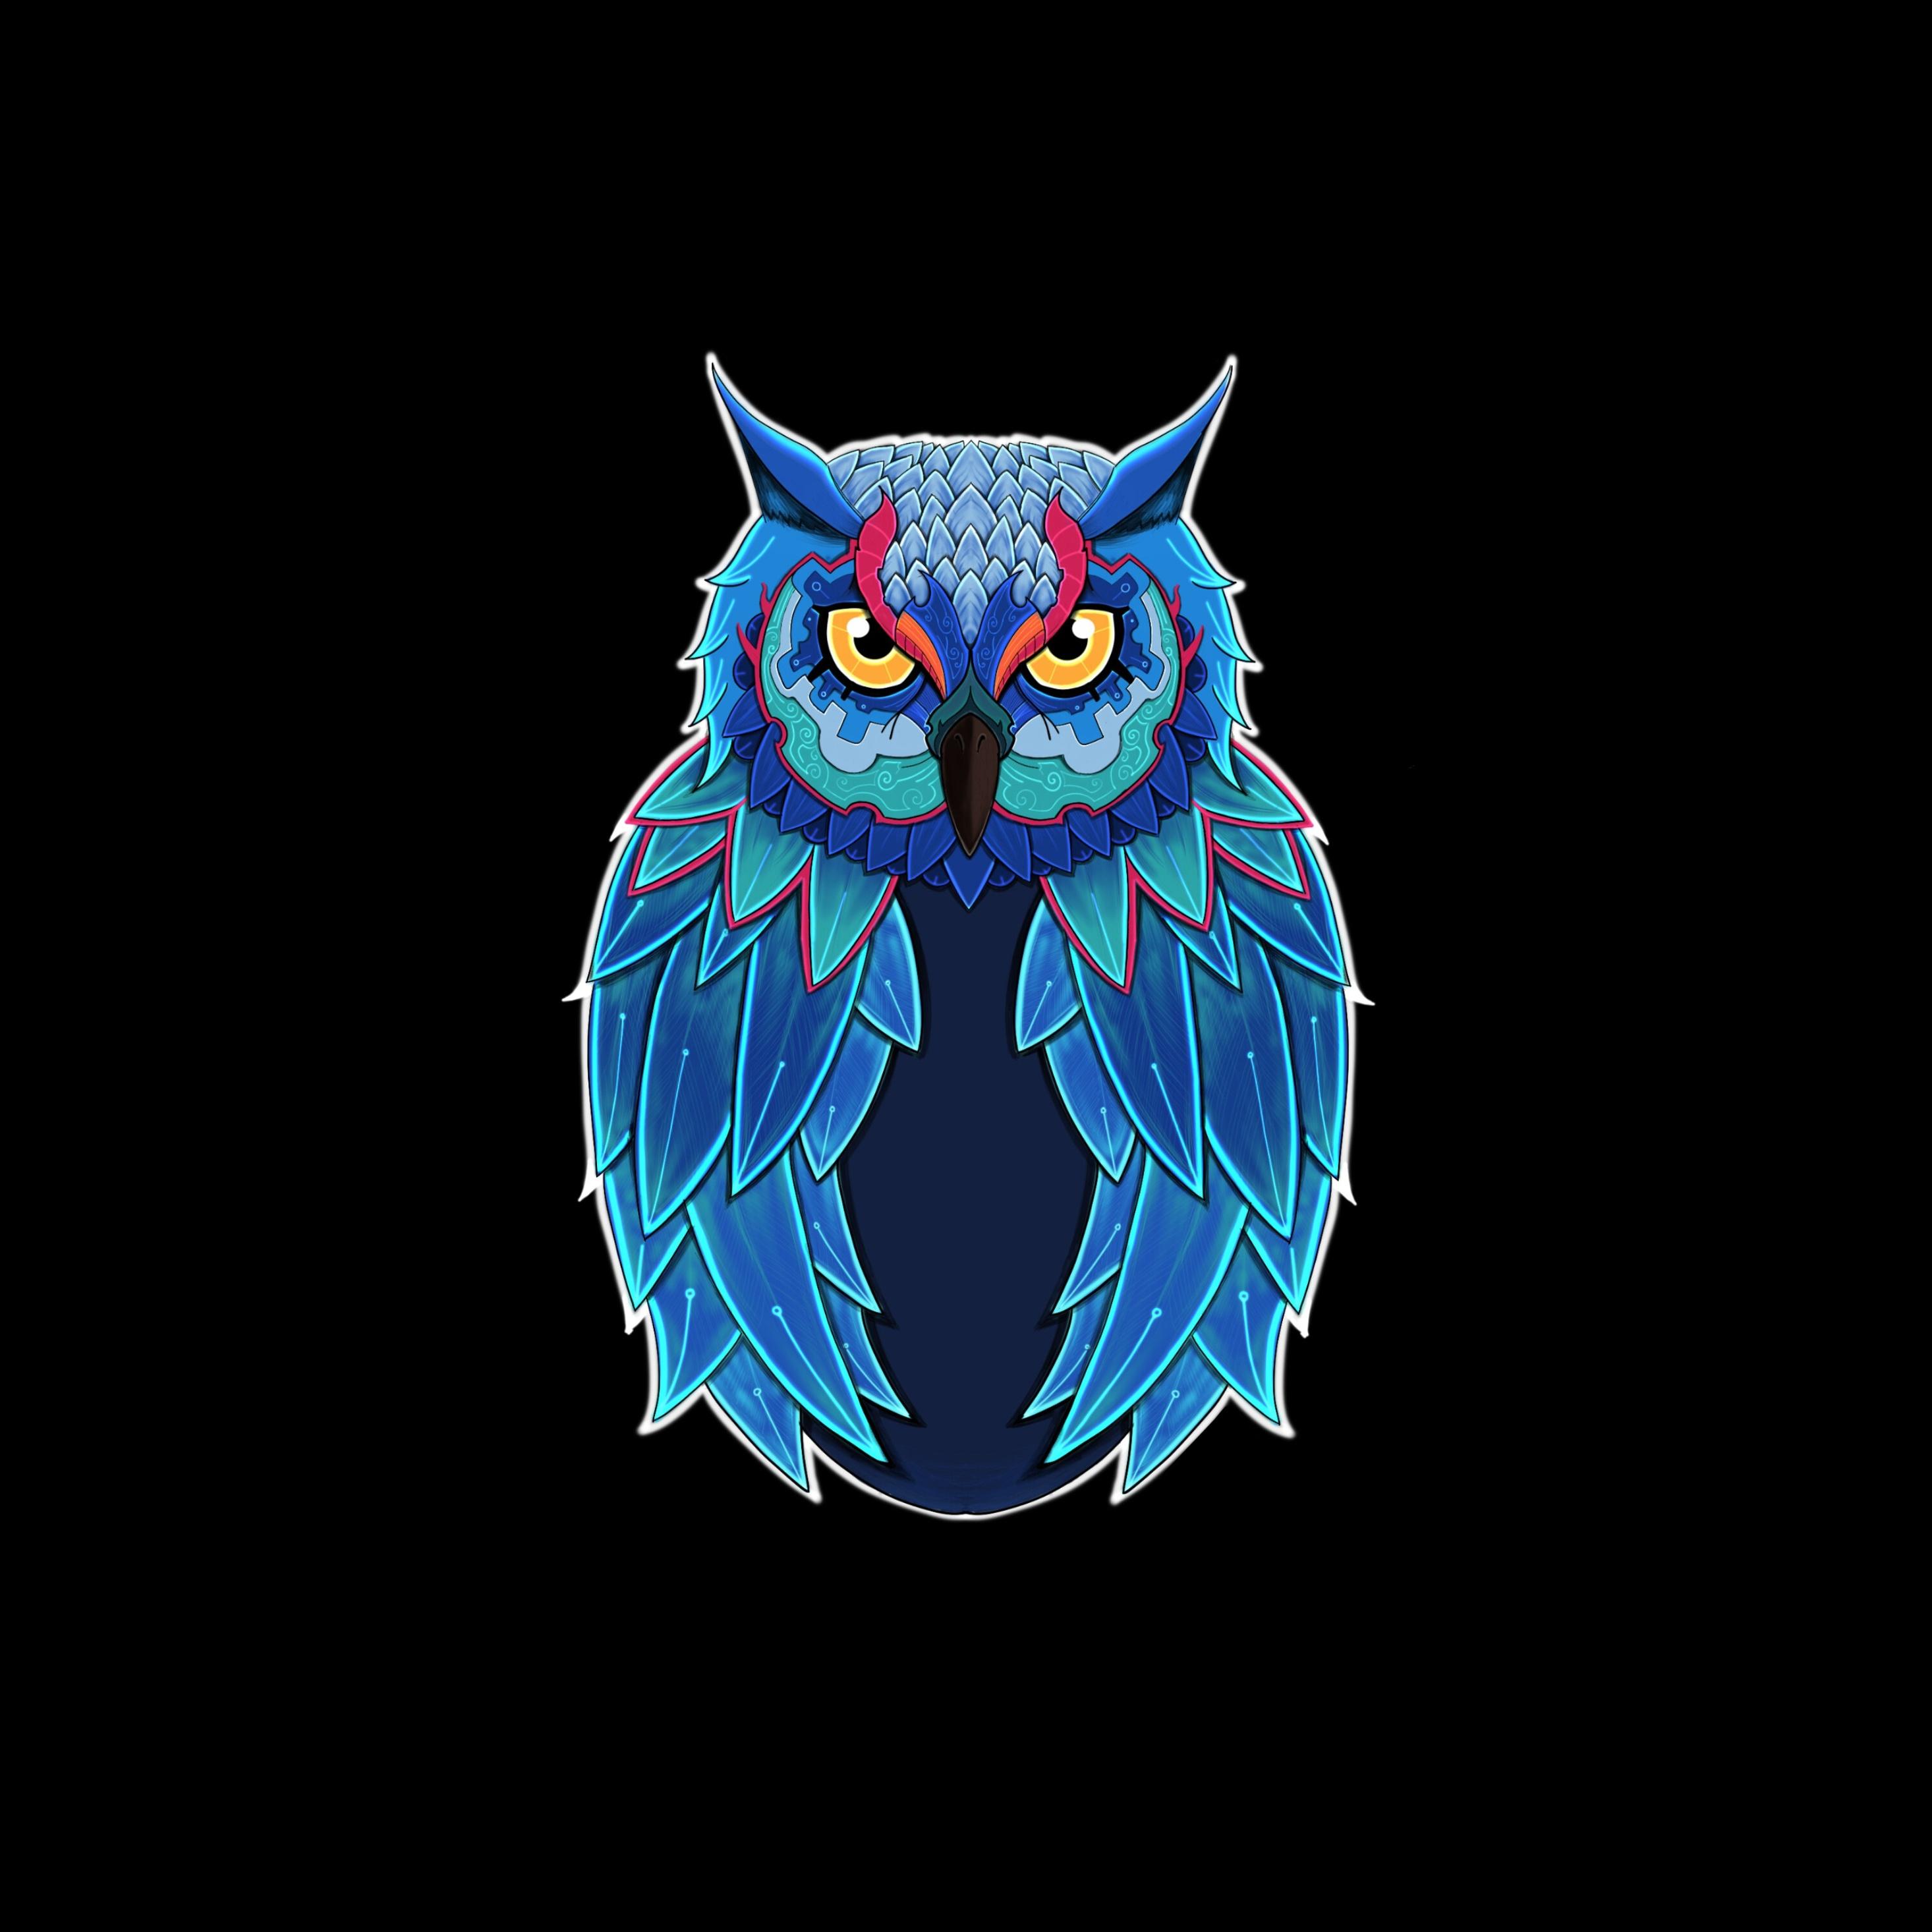 owl-dark-5k-pa.jpg